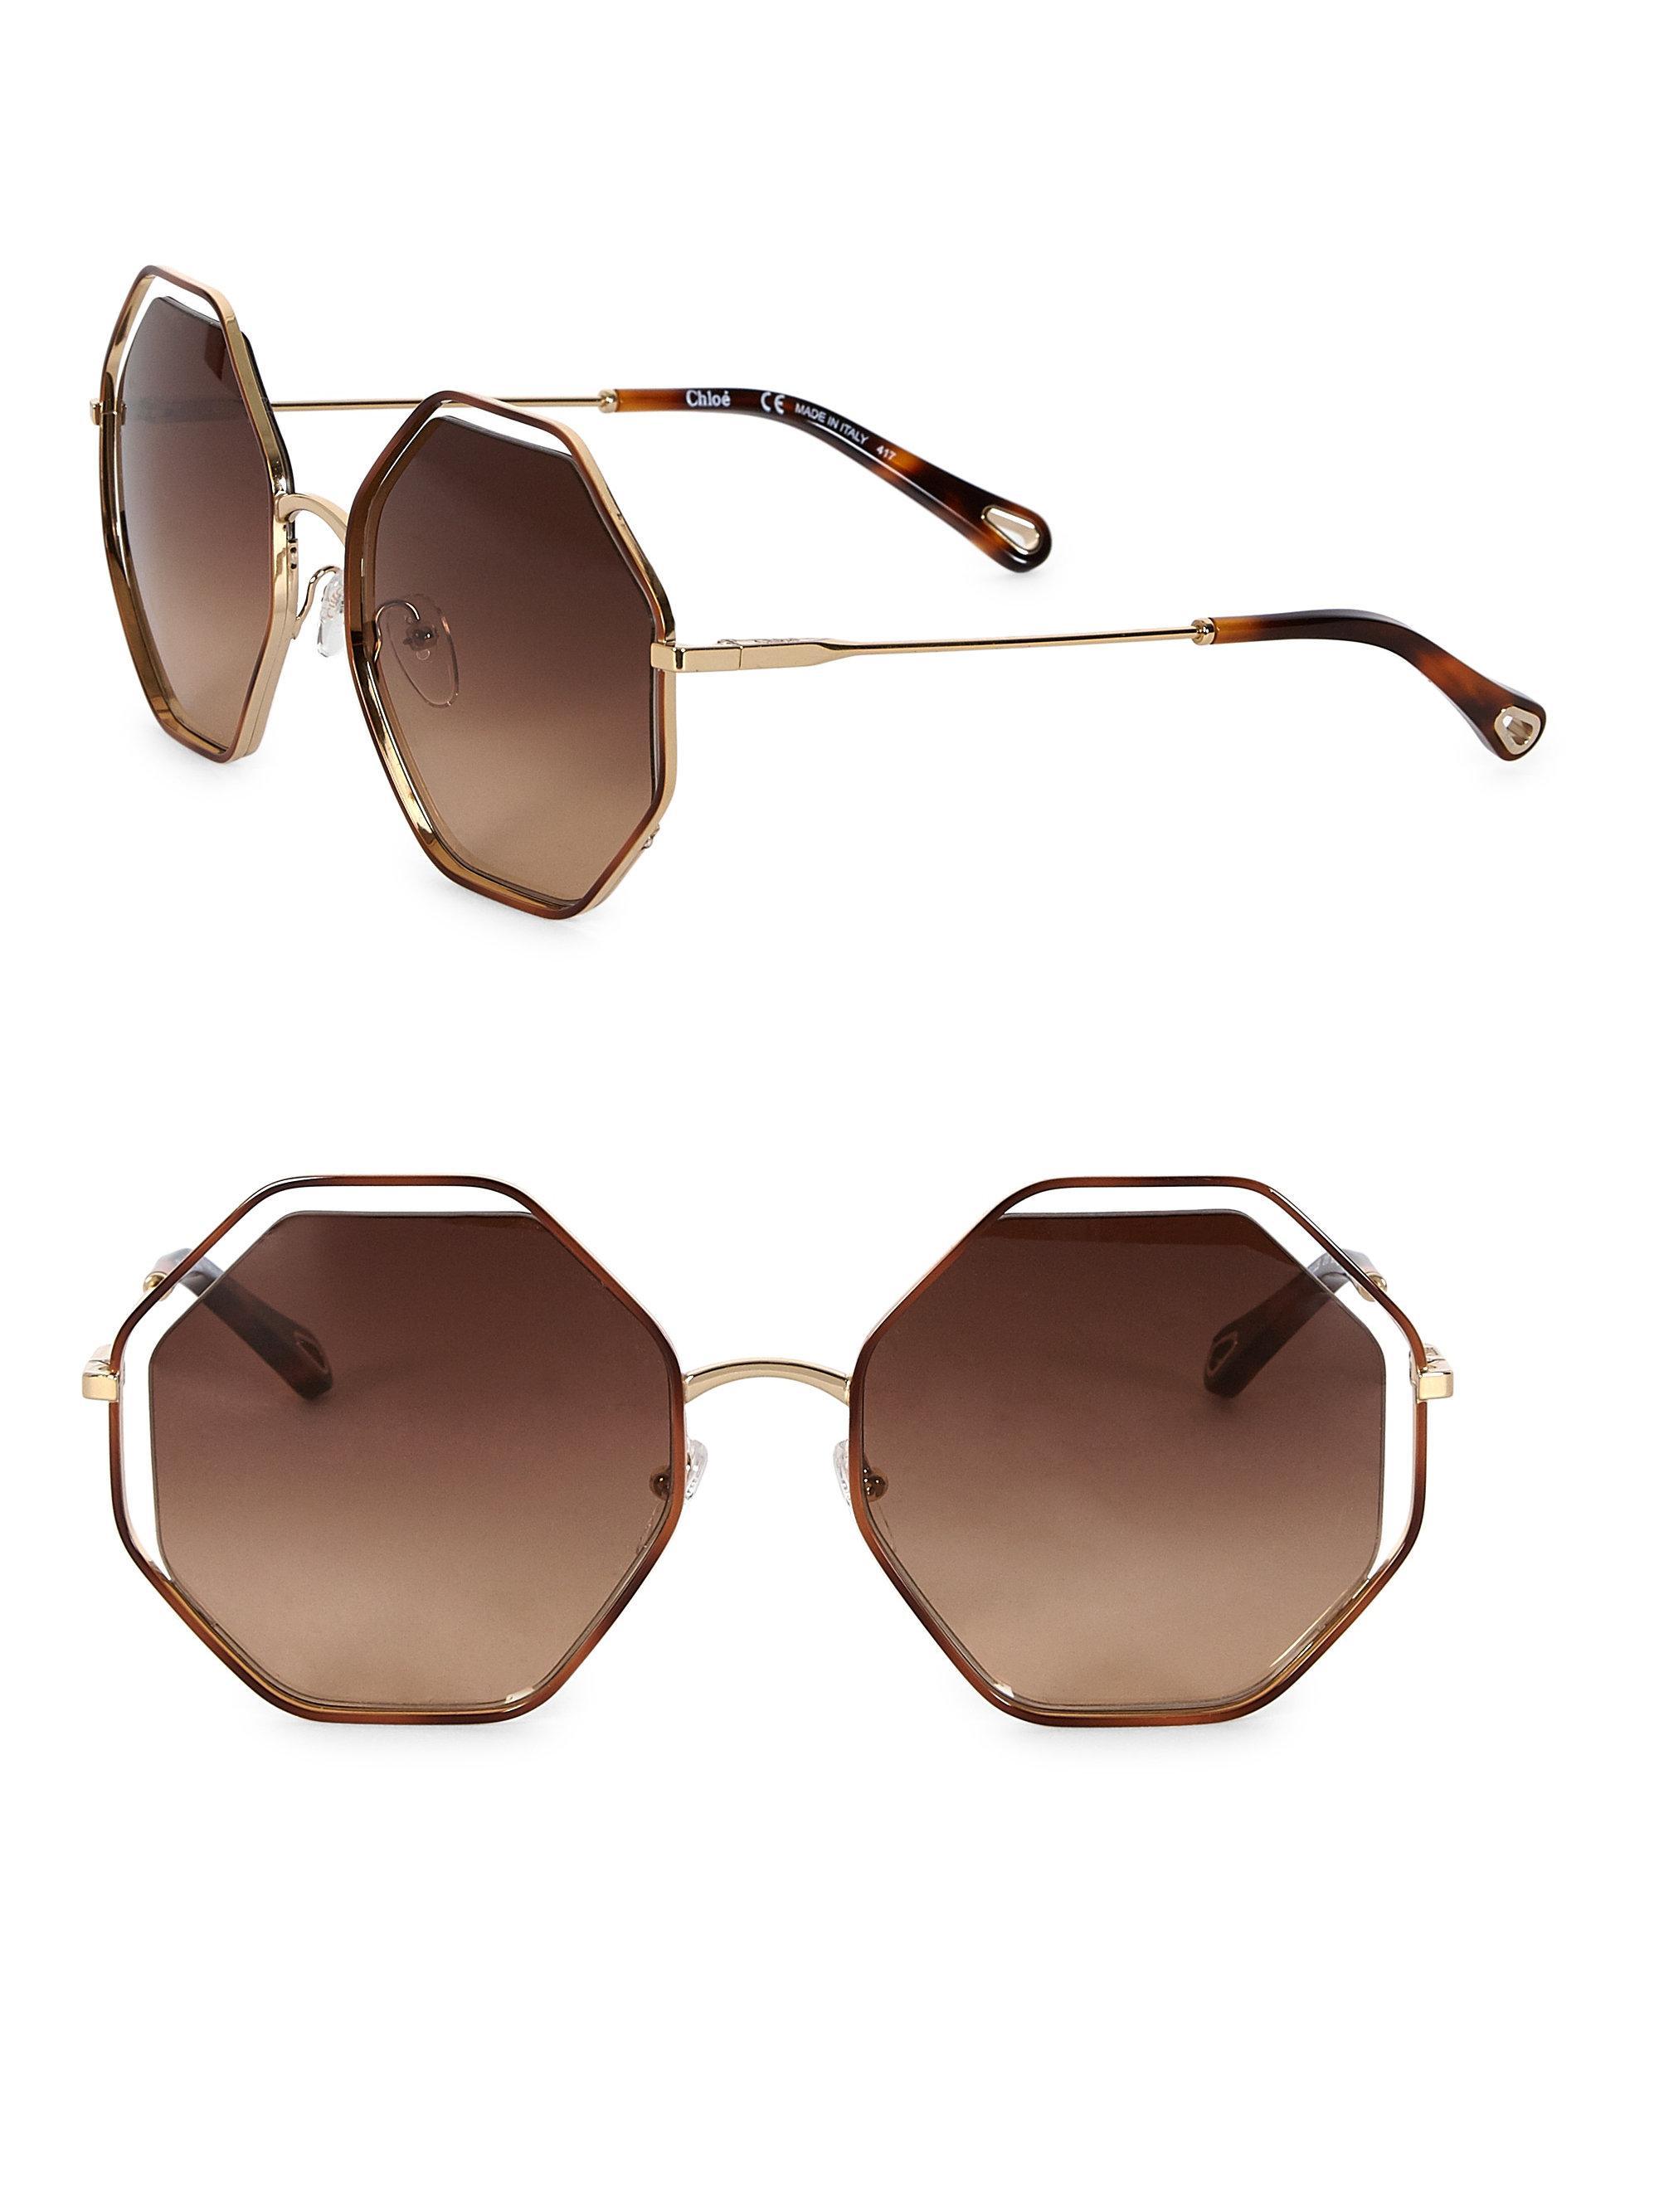 1aff9b4a30b Chloé Women s Poppy Octagon Sunglasses - Green in Brown - Lyst